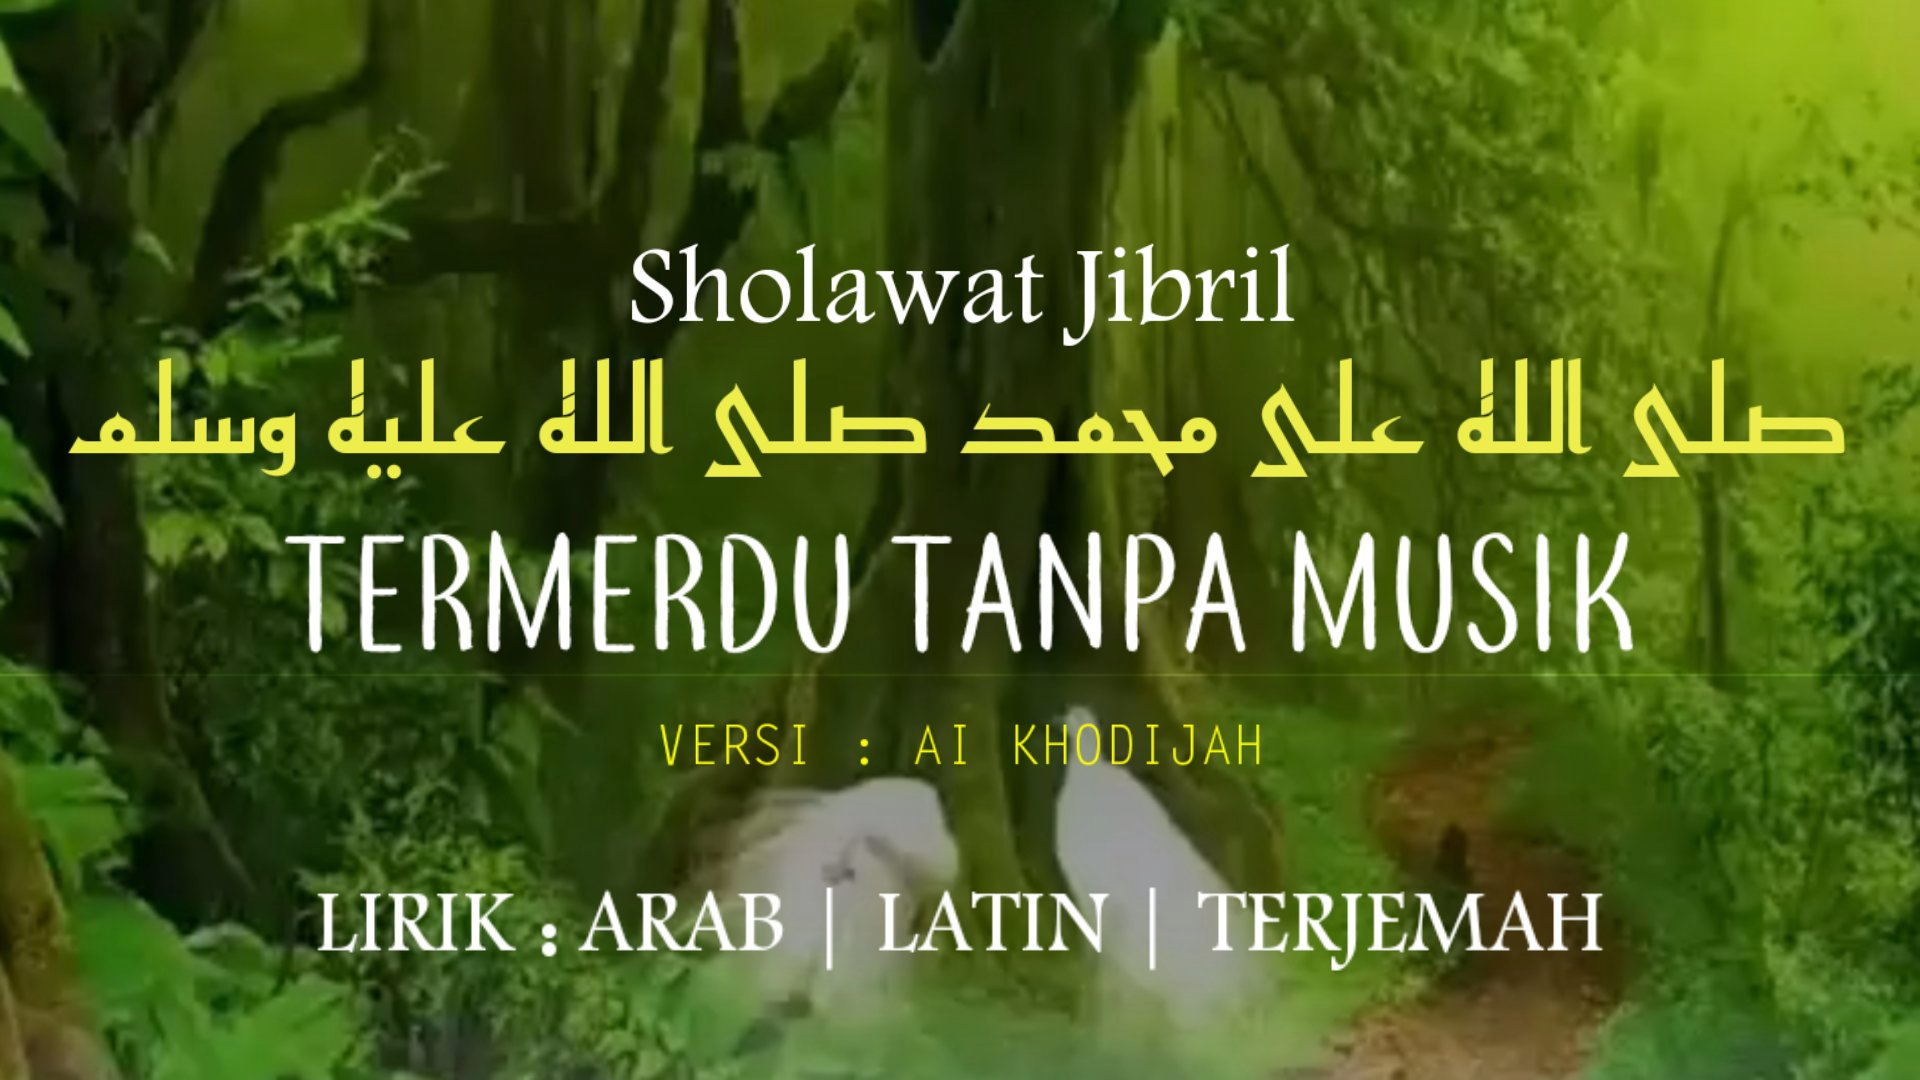 Lirik Shollallahu 'Ala Muhammad (صَلَّى اللهُ عَلَى مُحَمَّد) Arab, Latin, Terjemahan